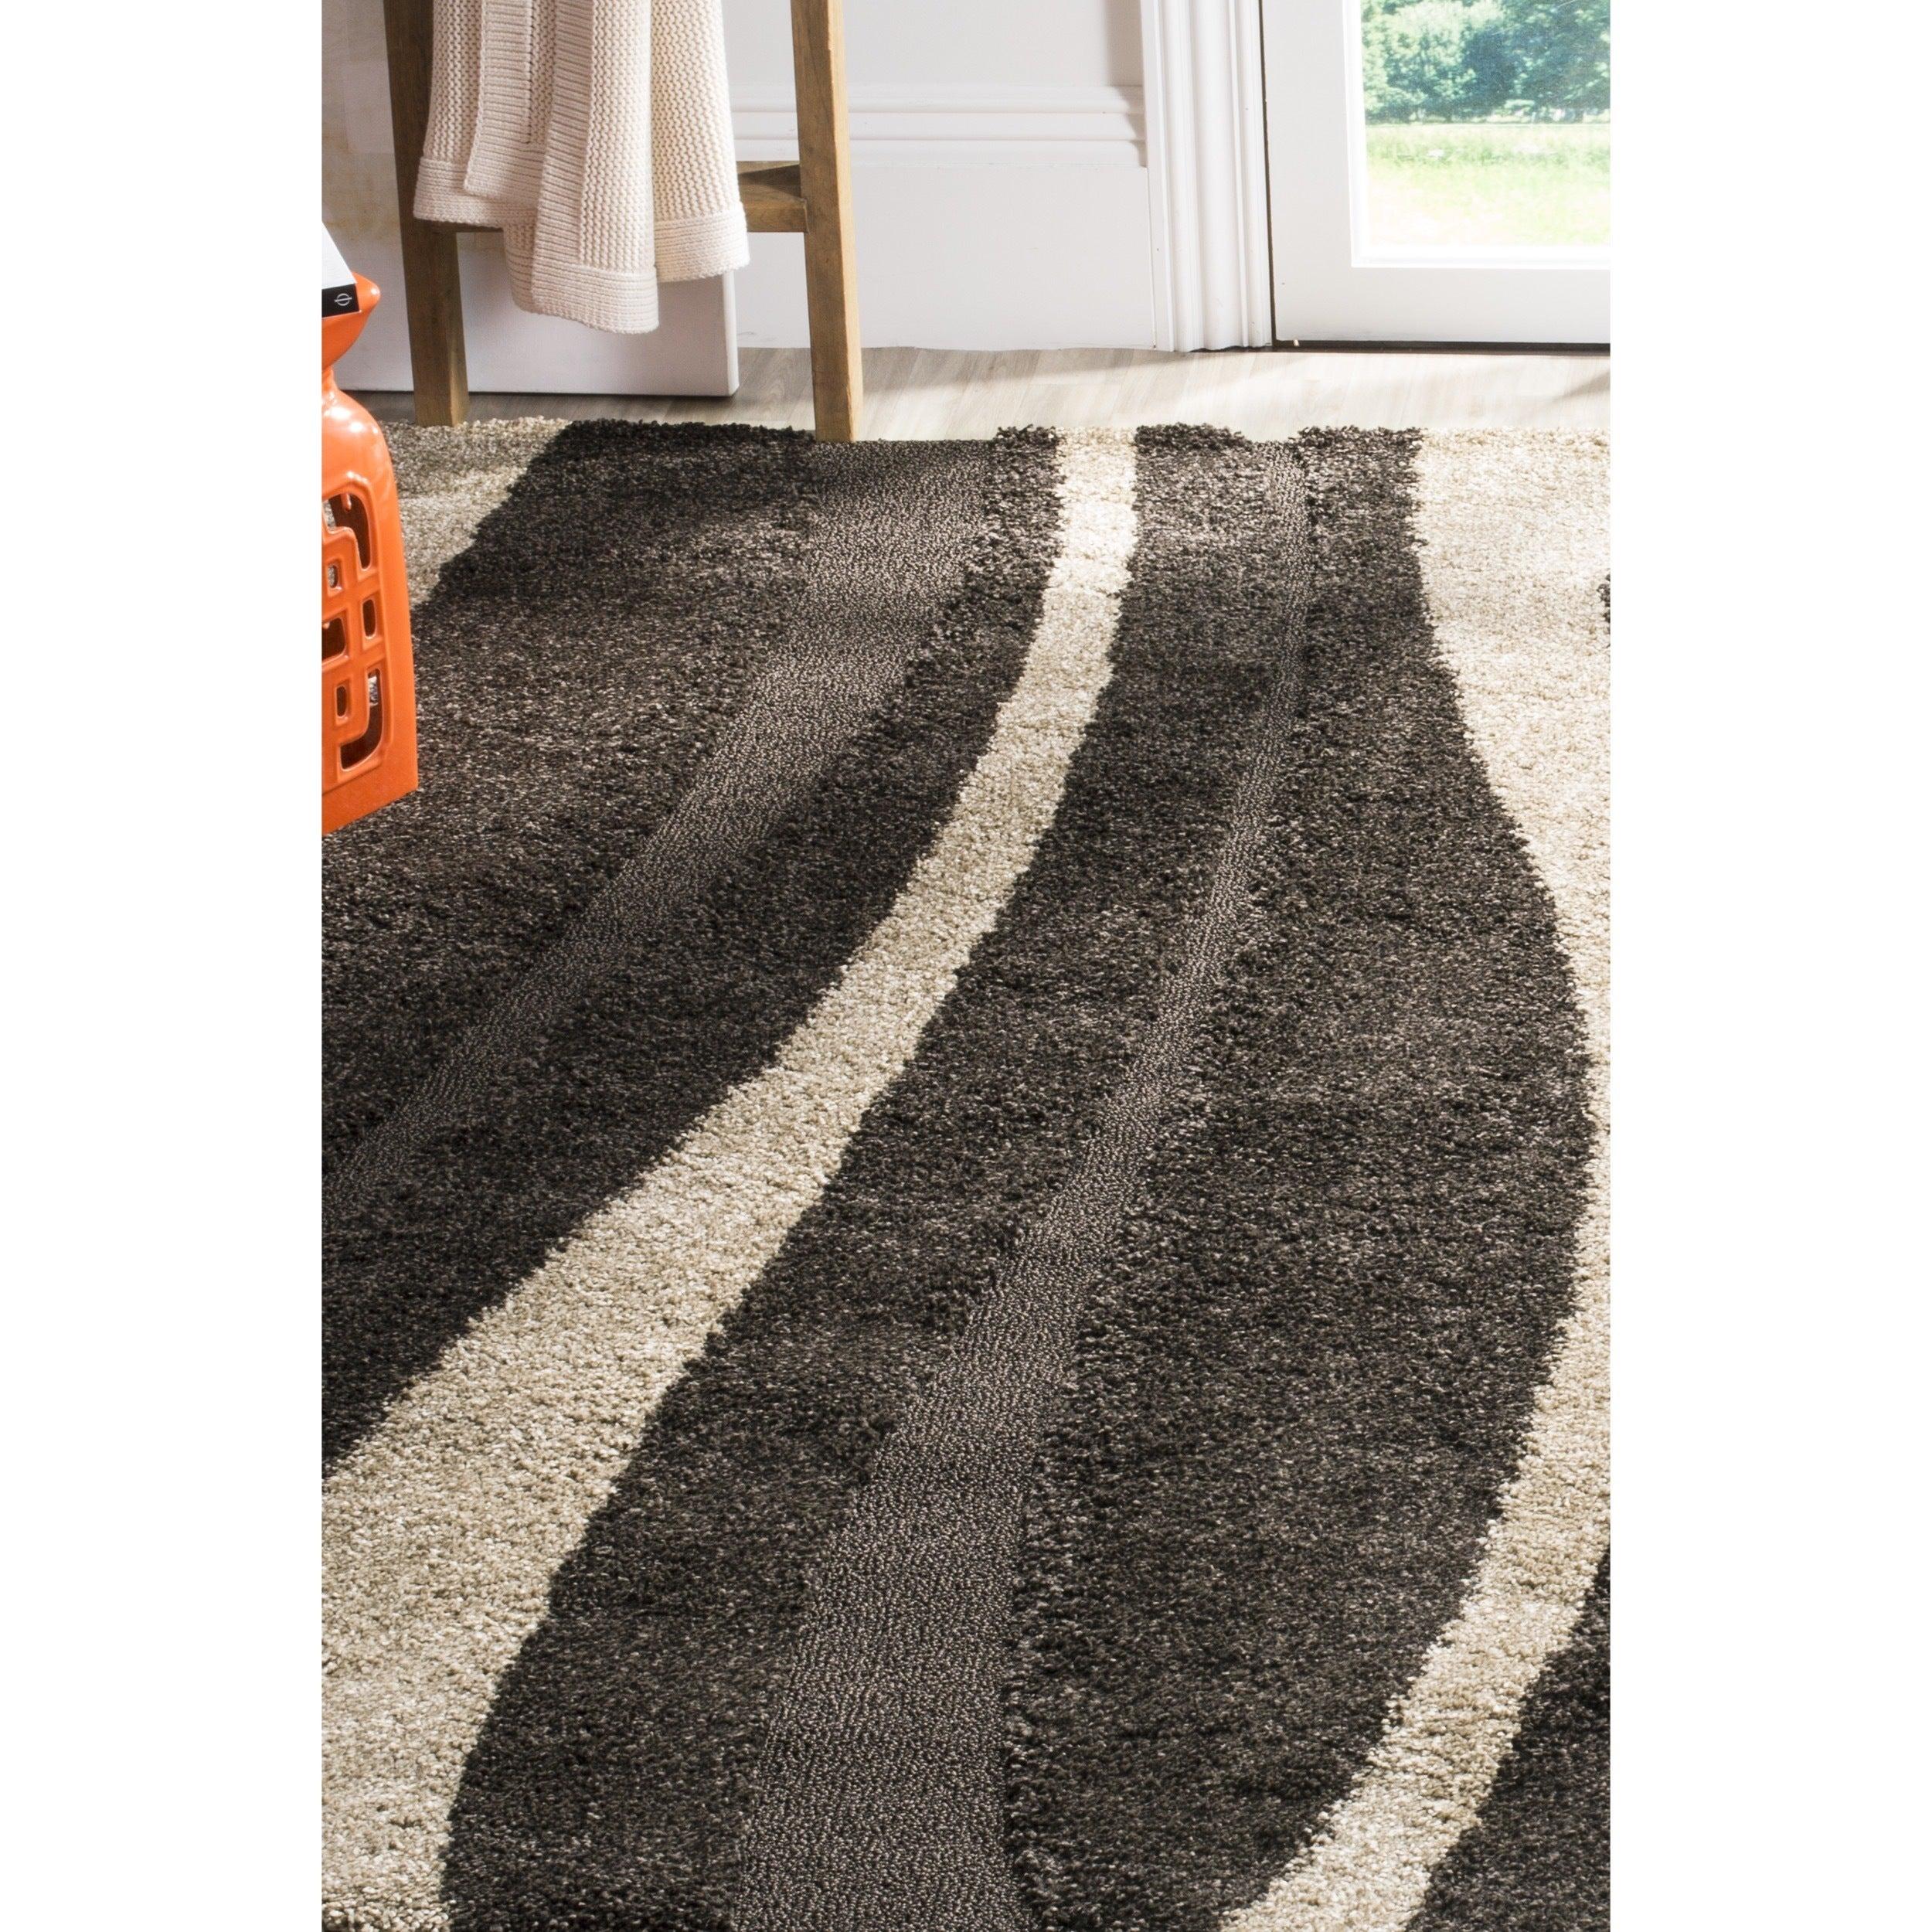 dp rug handmade dining polyester kitchen area malibu com shag amazon x safavieh brown charcoal collection